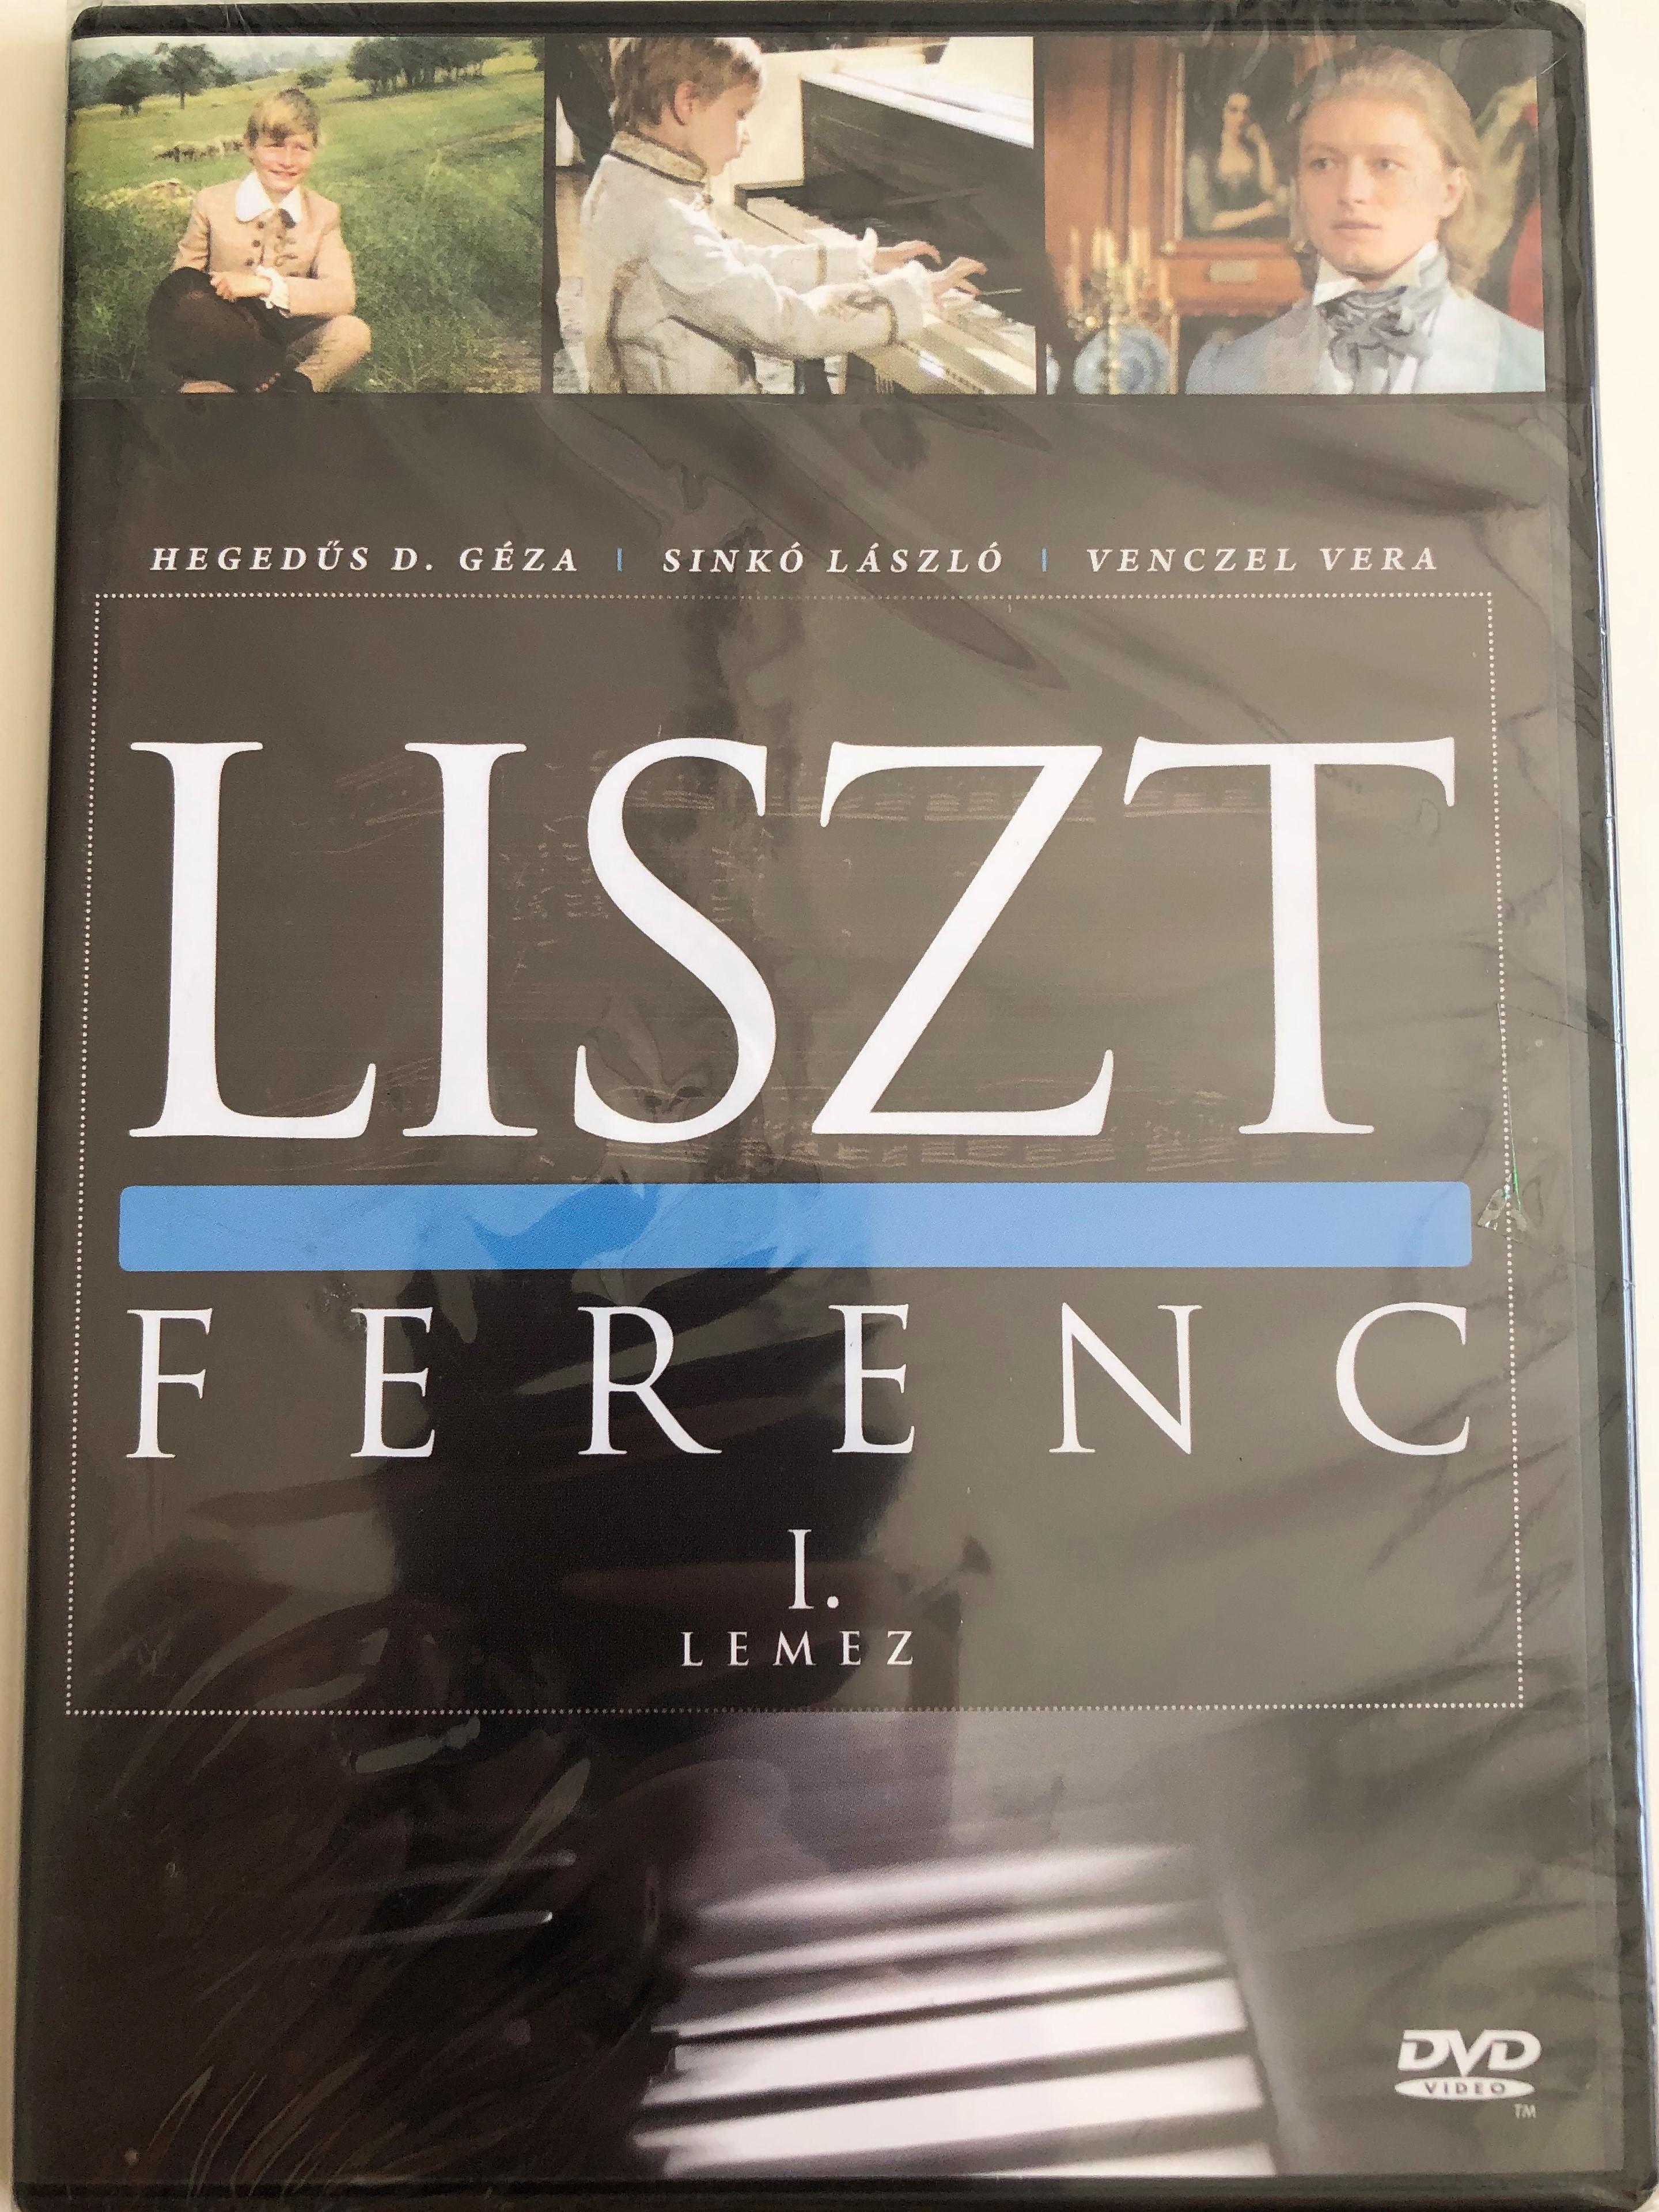 liszt-ferenc-tv-series-dvd-1982-directed-by-szinet-r-mikl-s-starring-sink-l-szl-venczel-vera-bolba-tam-s-heged-s-d.-g-za-mtva-episodes-1-2-1-.jpg